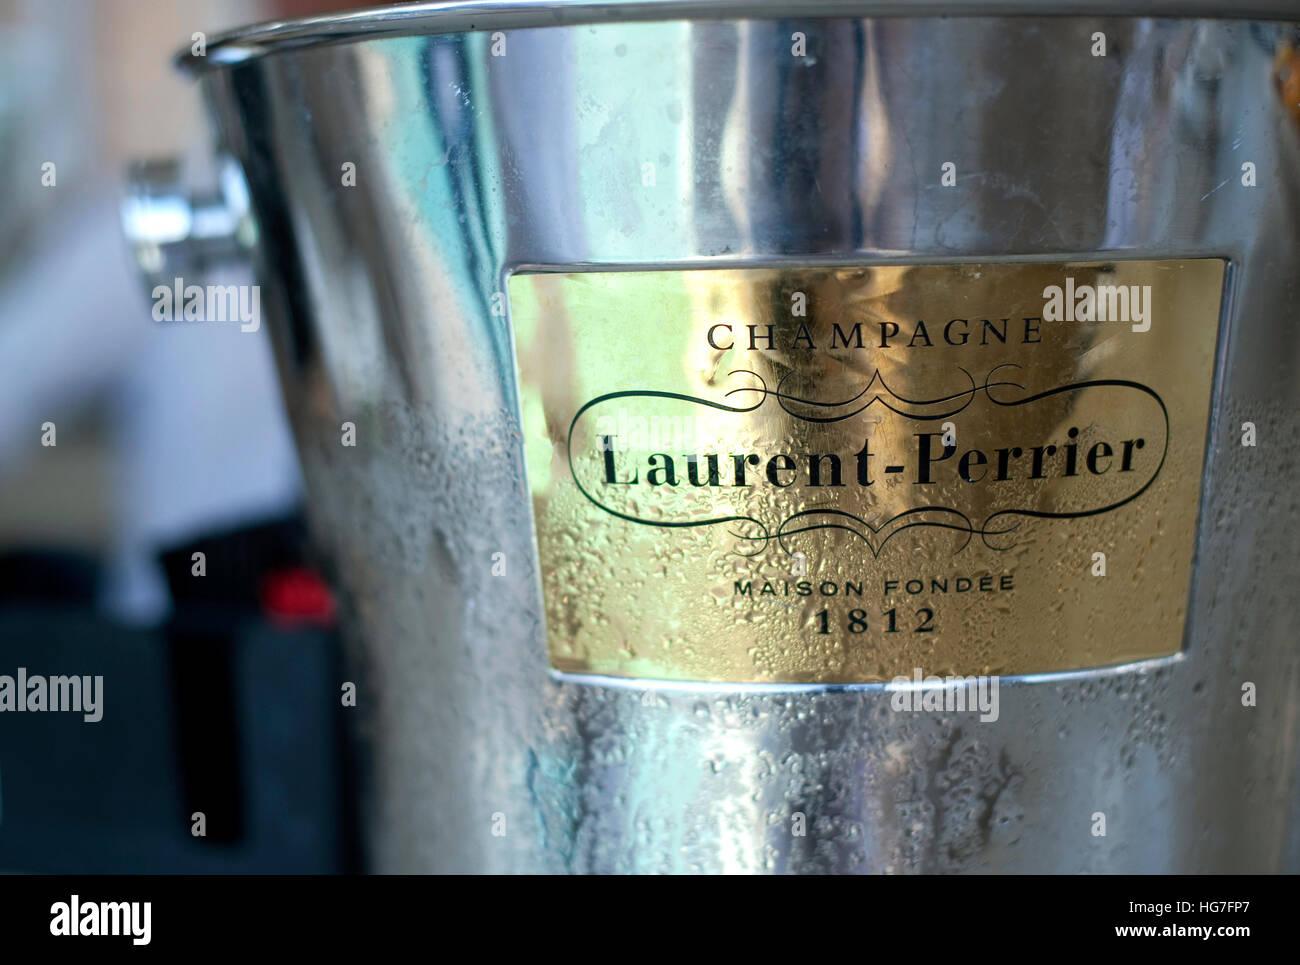 Laurent Perrier champagne ice bucket - Stock Image